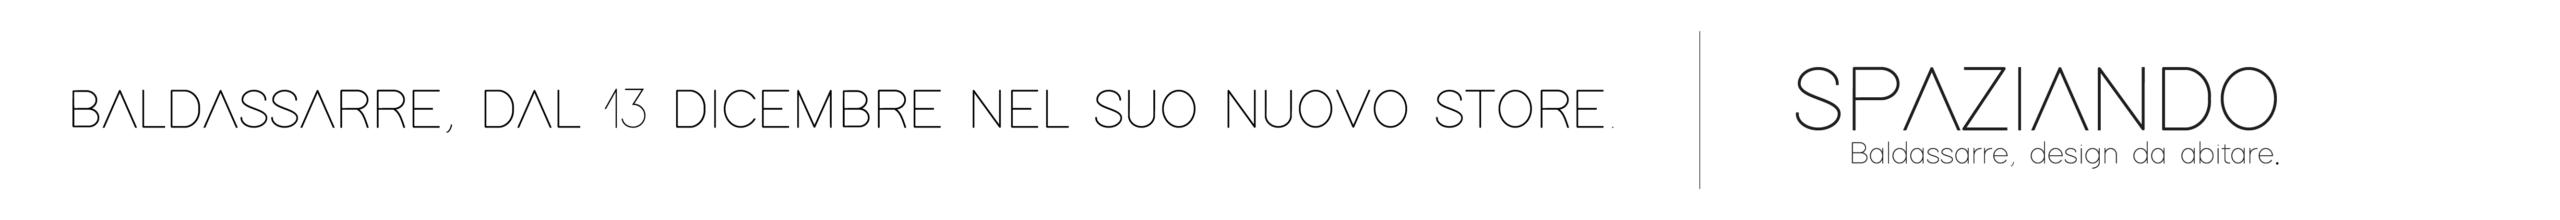 Baldassarre Nuovo Store (1280x110 - Top Banner)